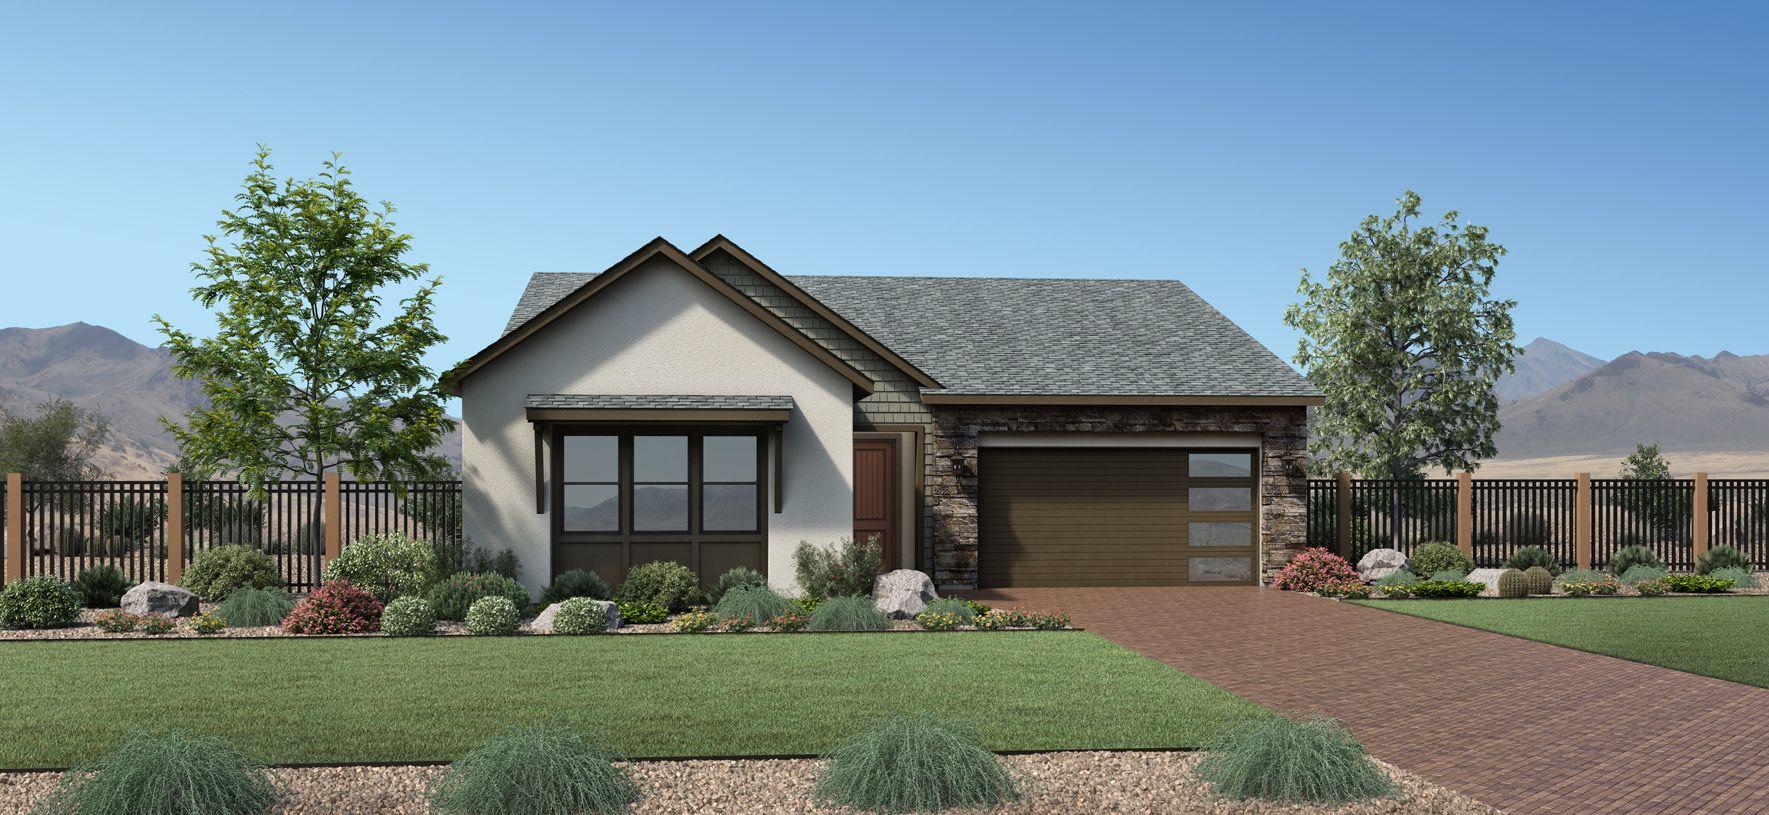 Elevation Image:Modern Ranch